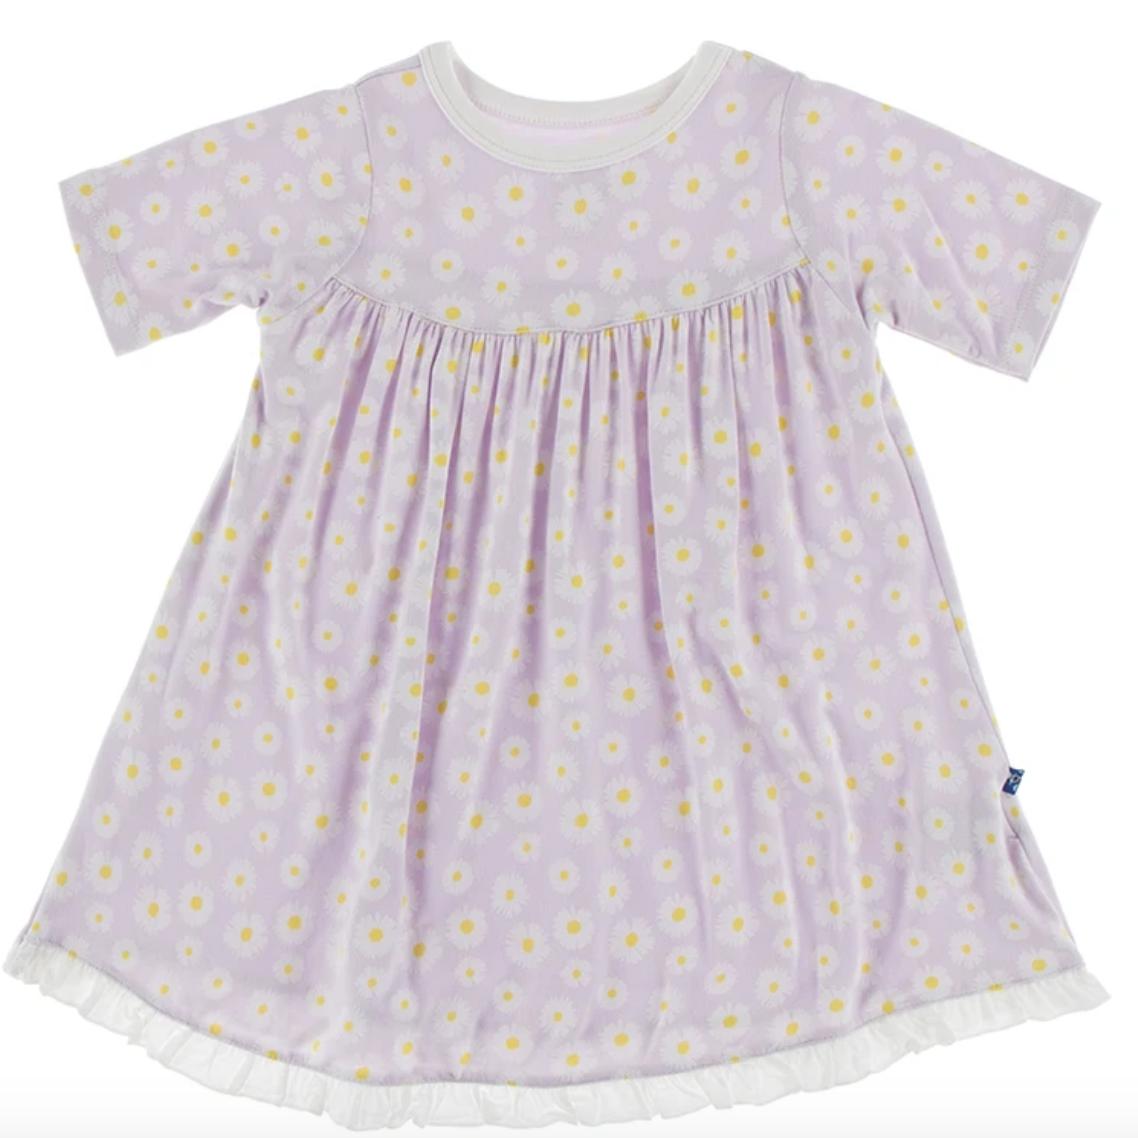 Thistle Chamomile s/s swing dress